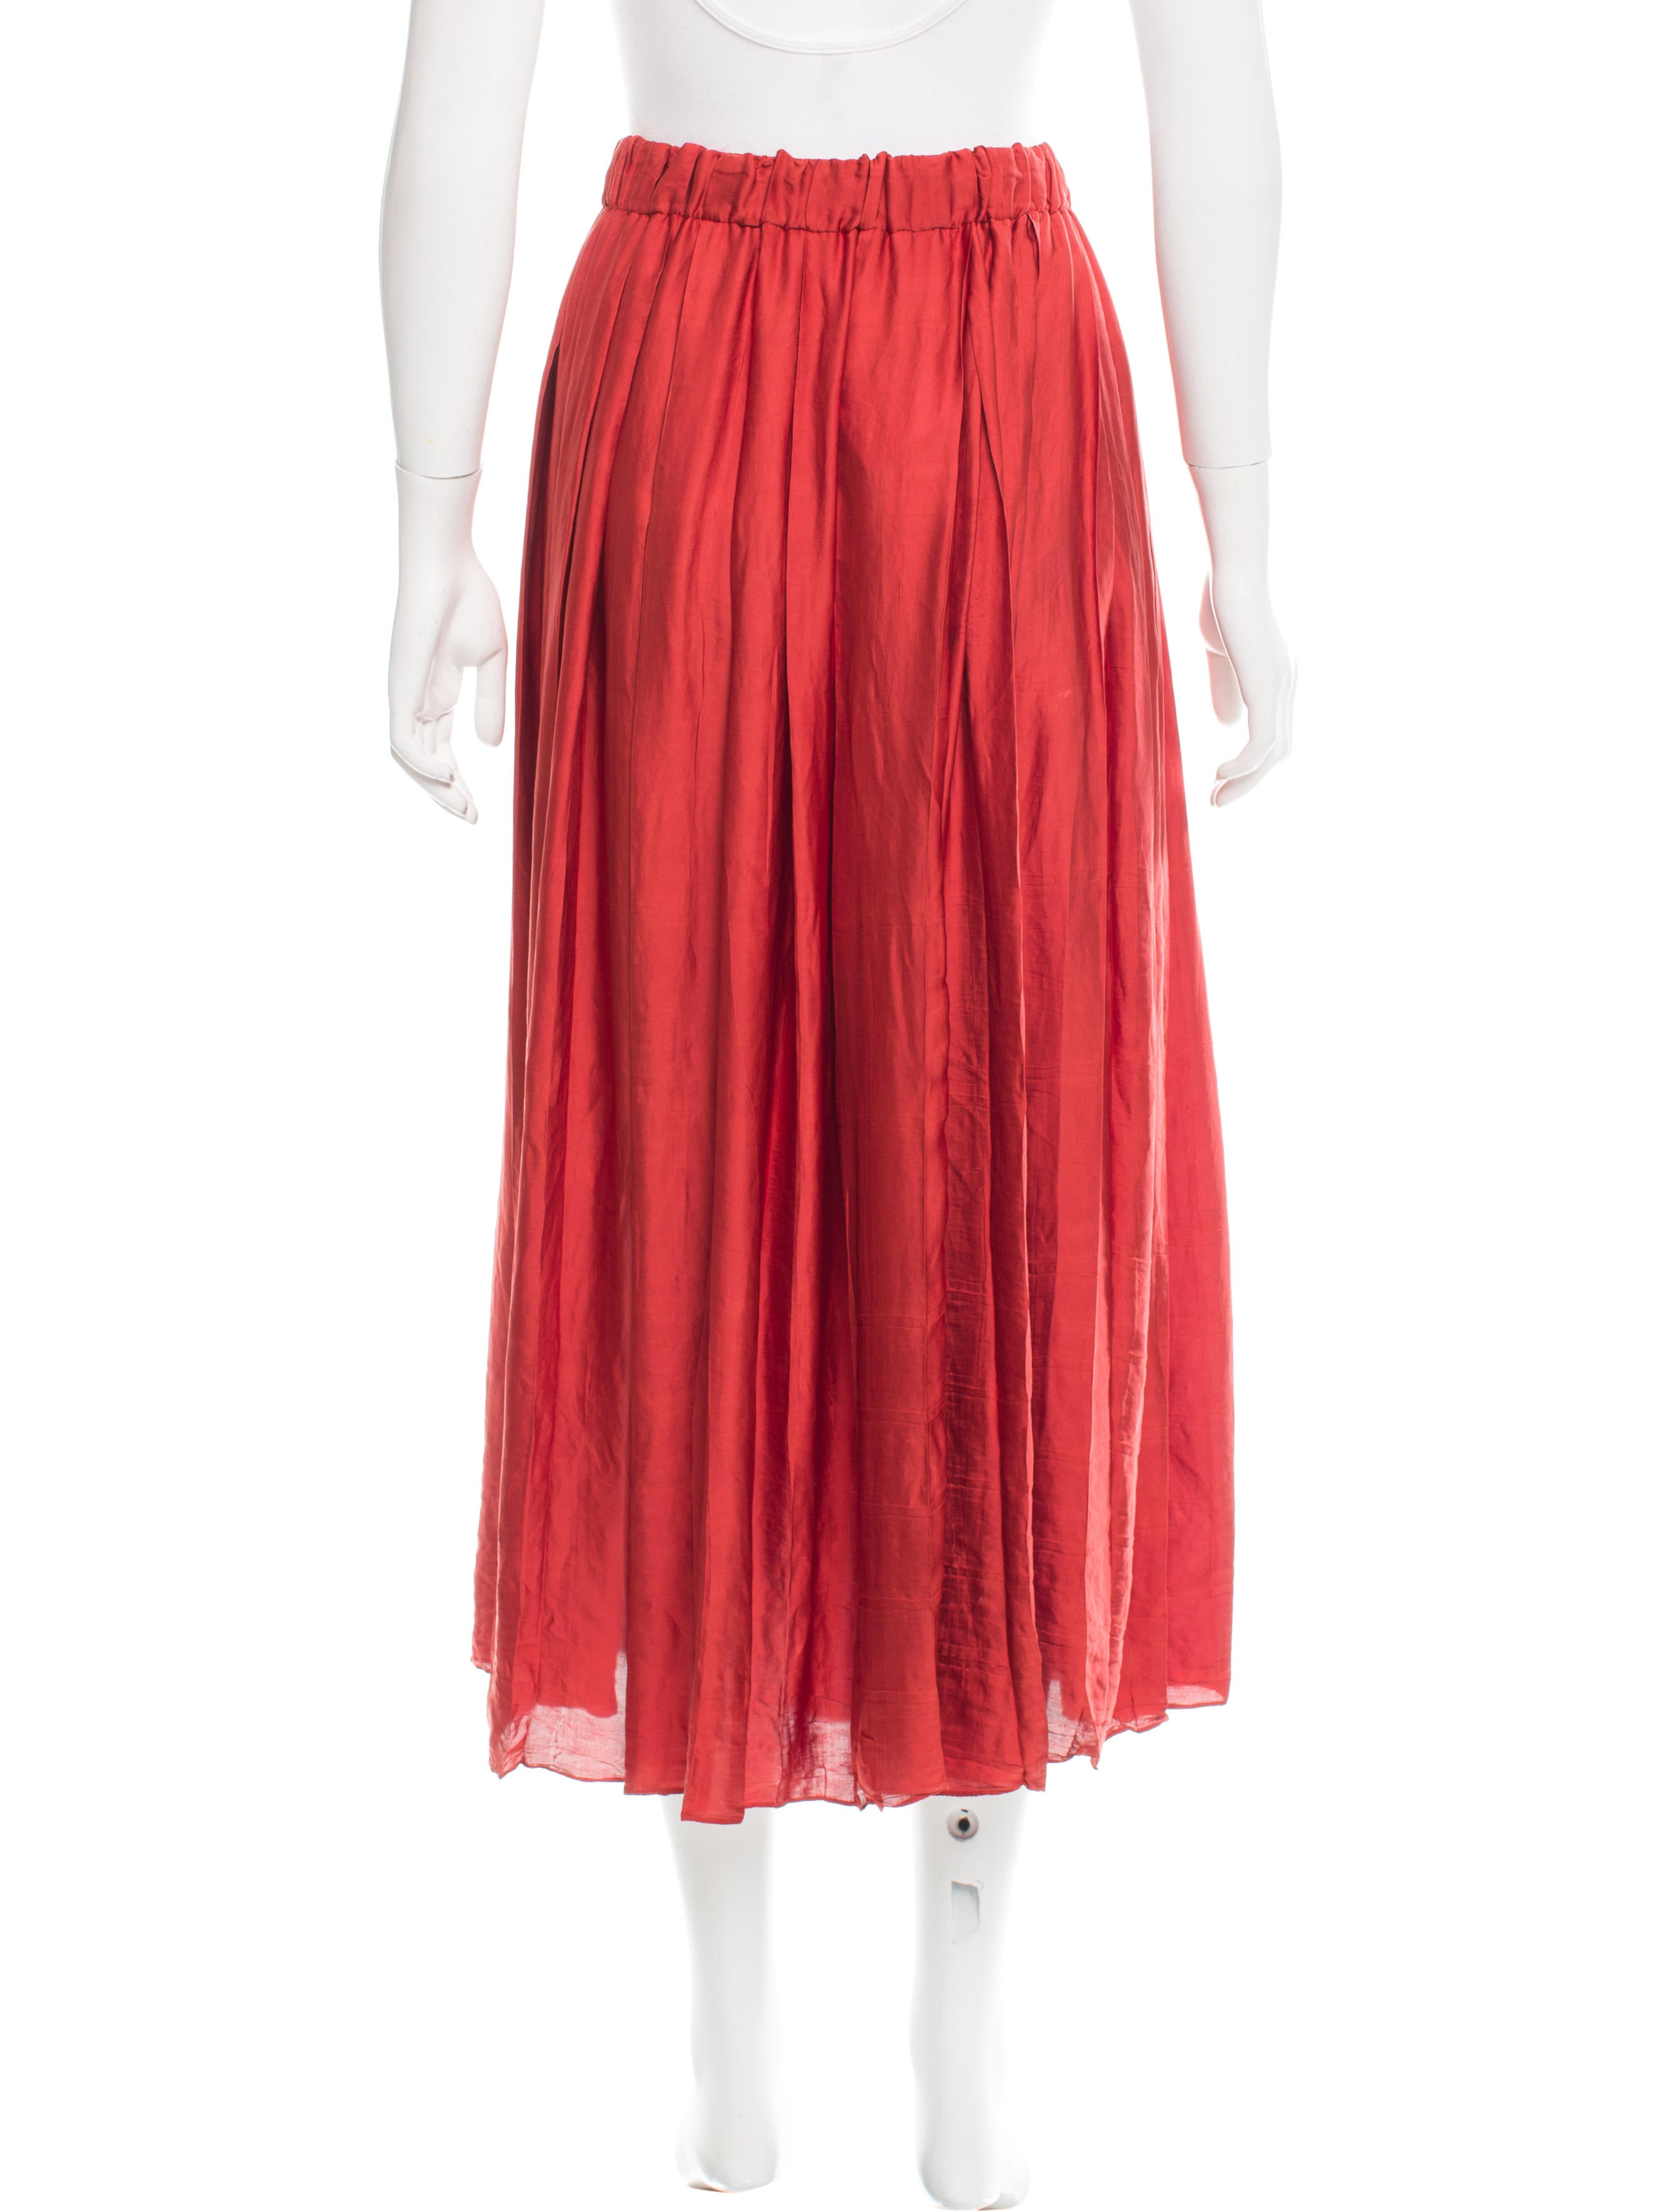 gucci satin midi skirt clothing guc140491 the realreal